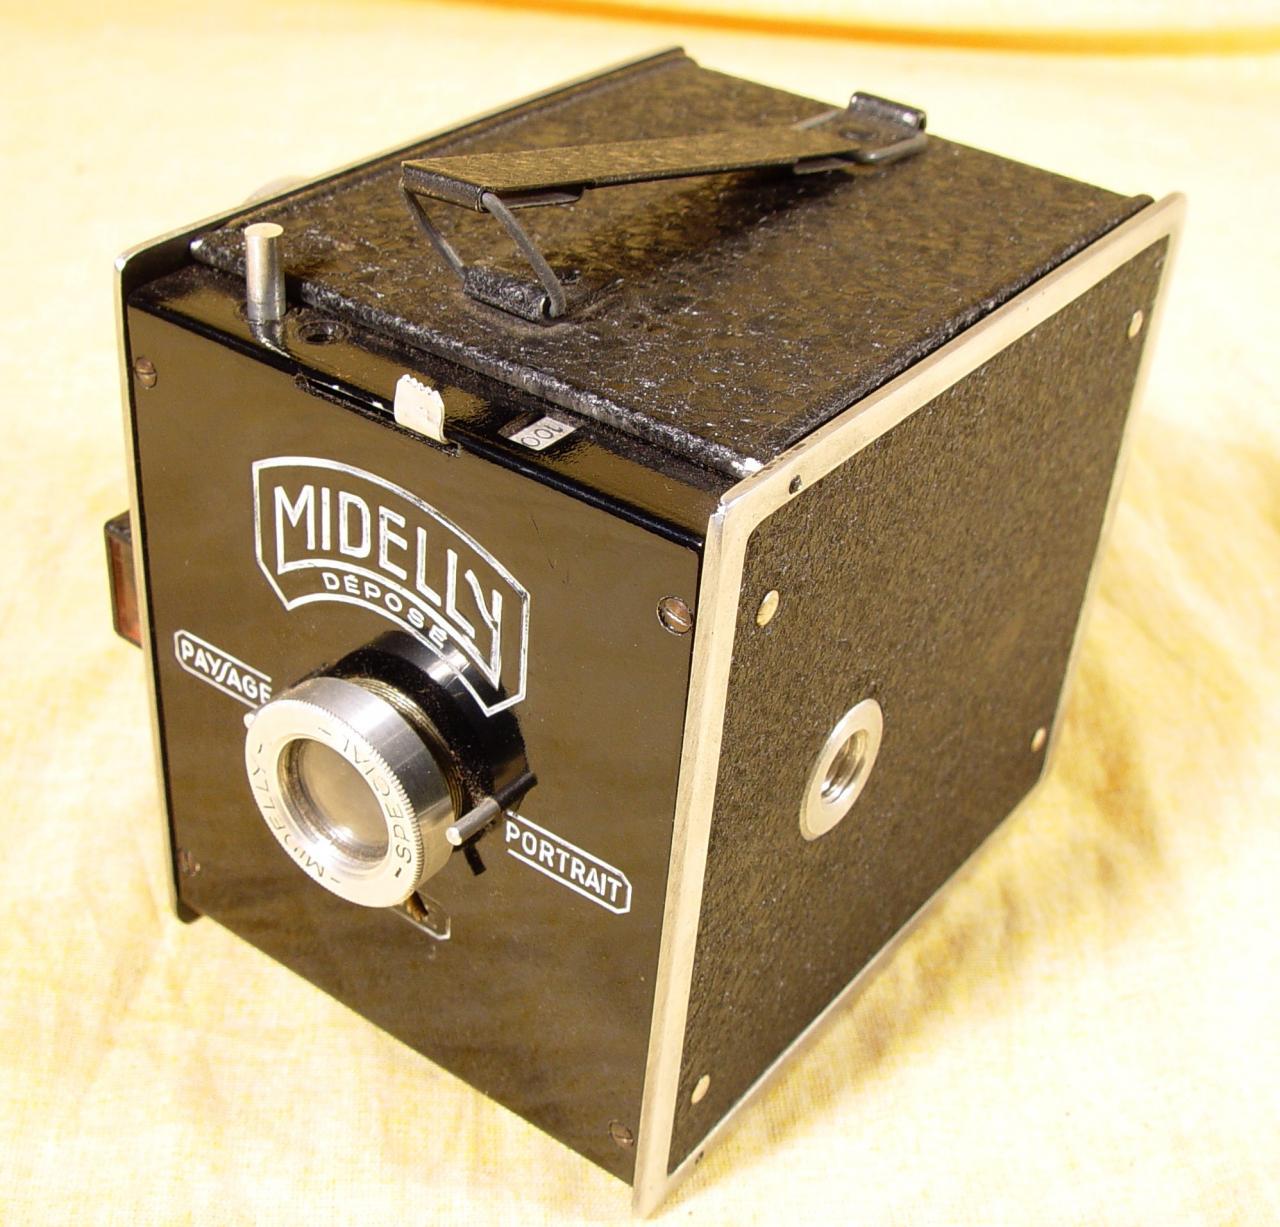 Wallpaper 3033-1 MIDELLY Demilly box modele de base, collection AMI Appareils photos